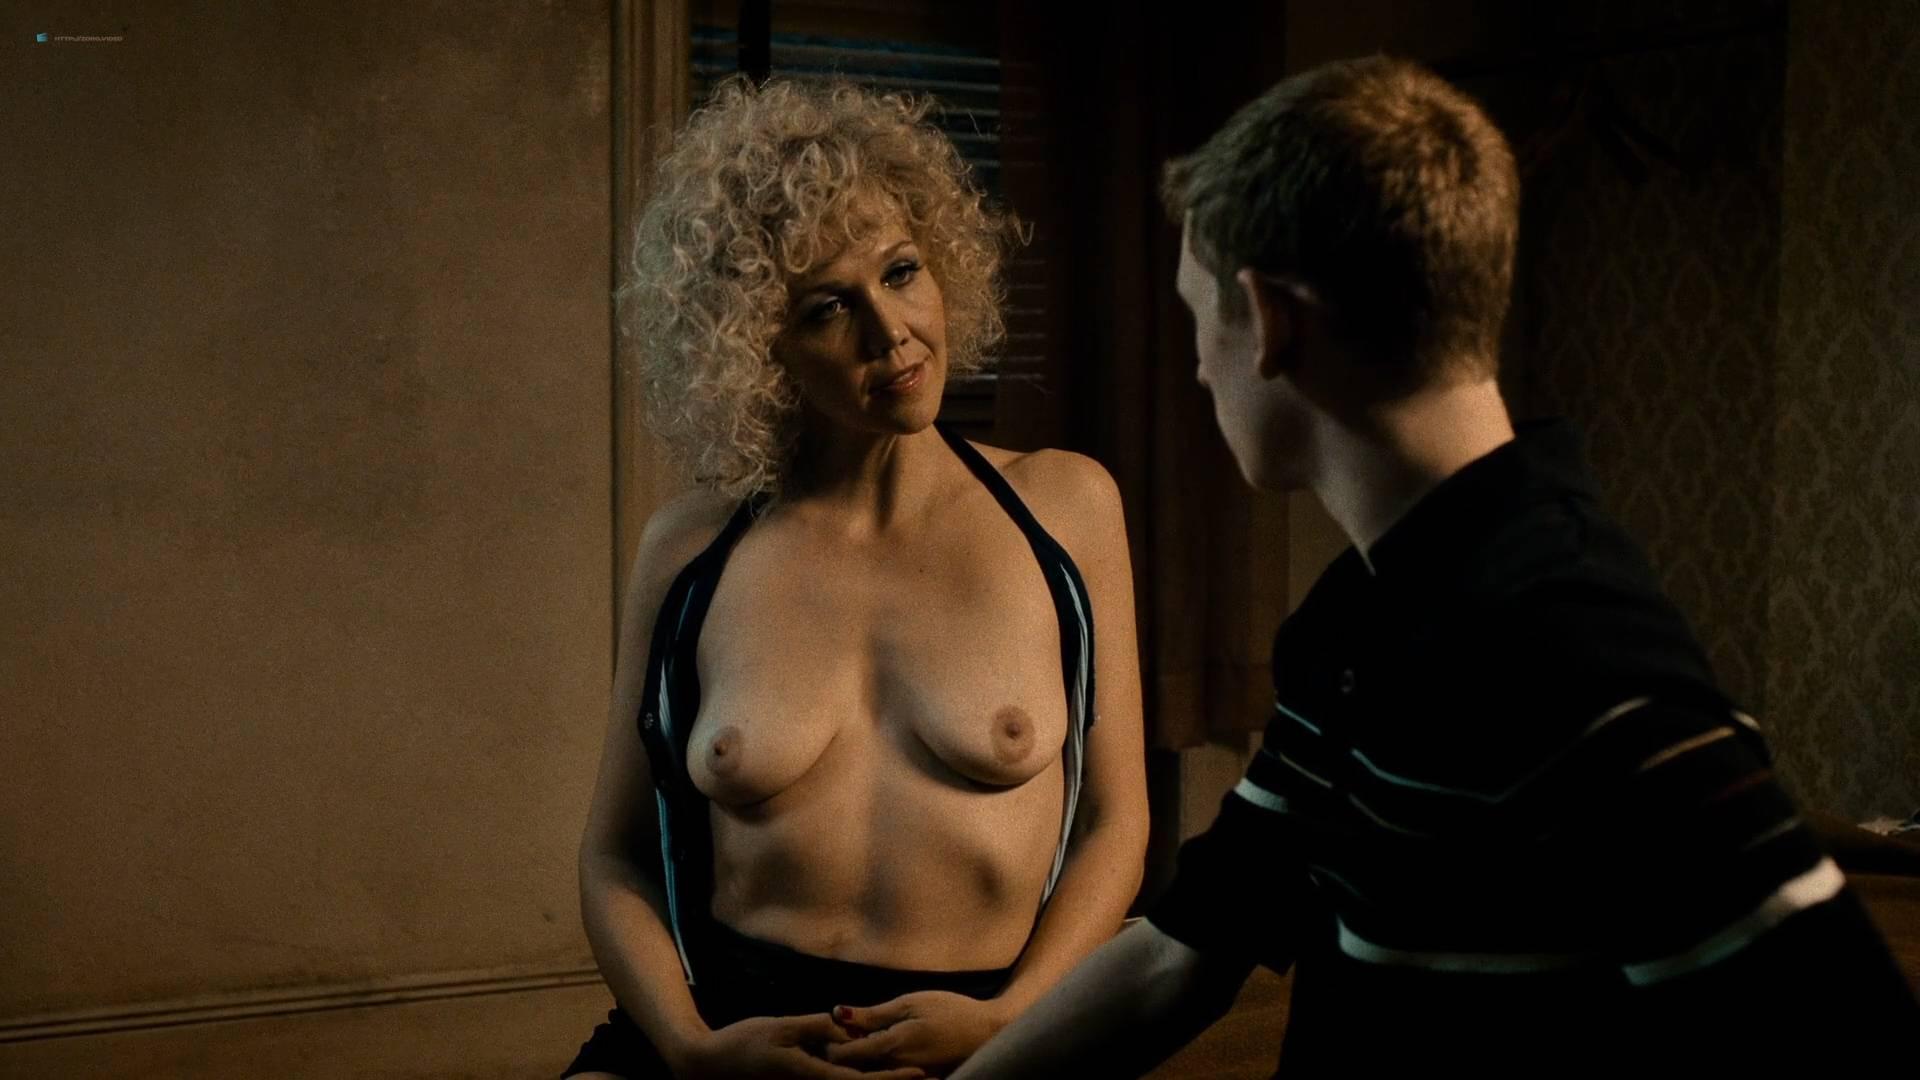 maggie gyllenhaal topless